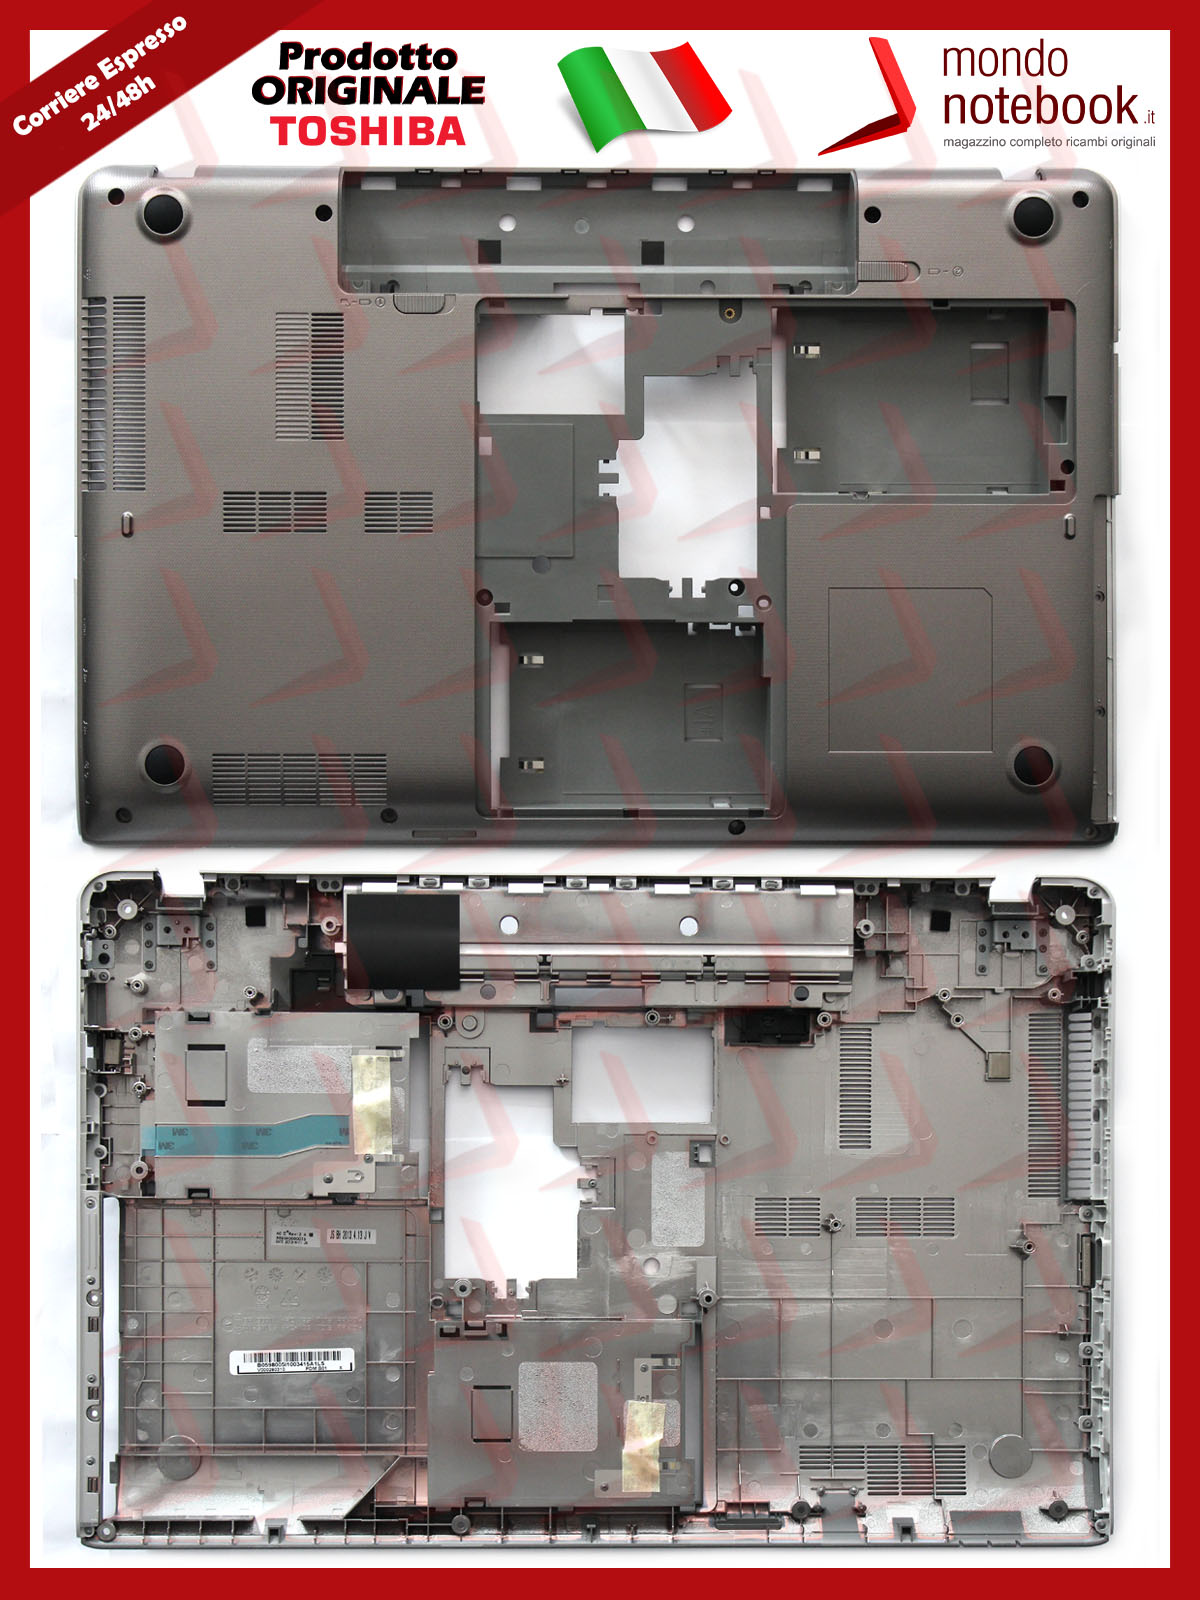 https://www.mondonotebook.it/5373/apple-iphone-6-volume-key-flex-cable-ribbon-replacement-grade-s-.jpg